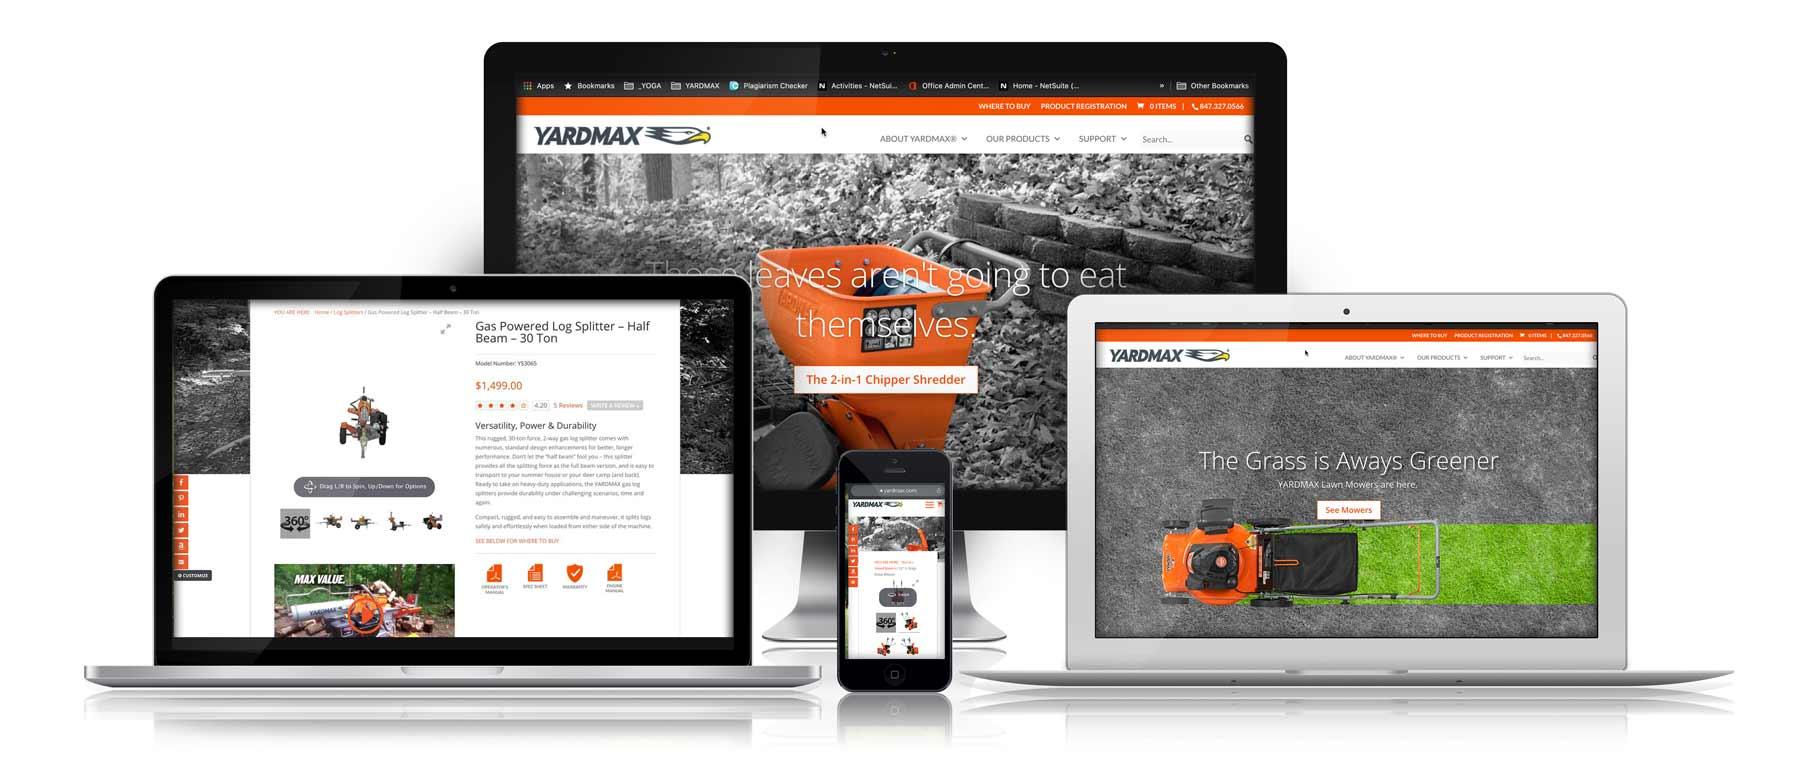 Yardmax.com screen